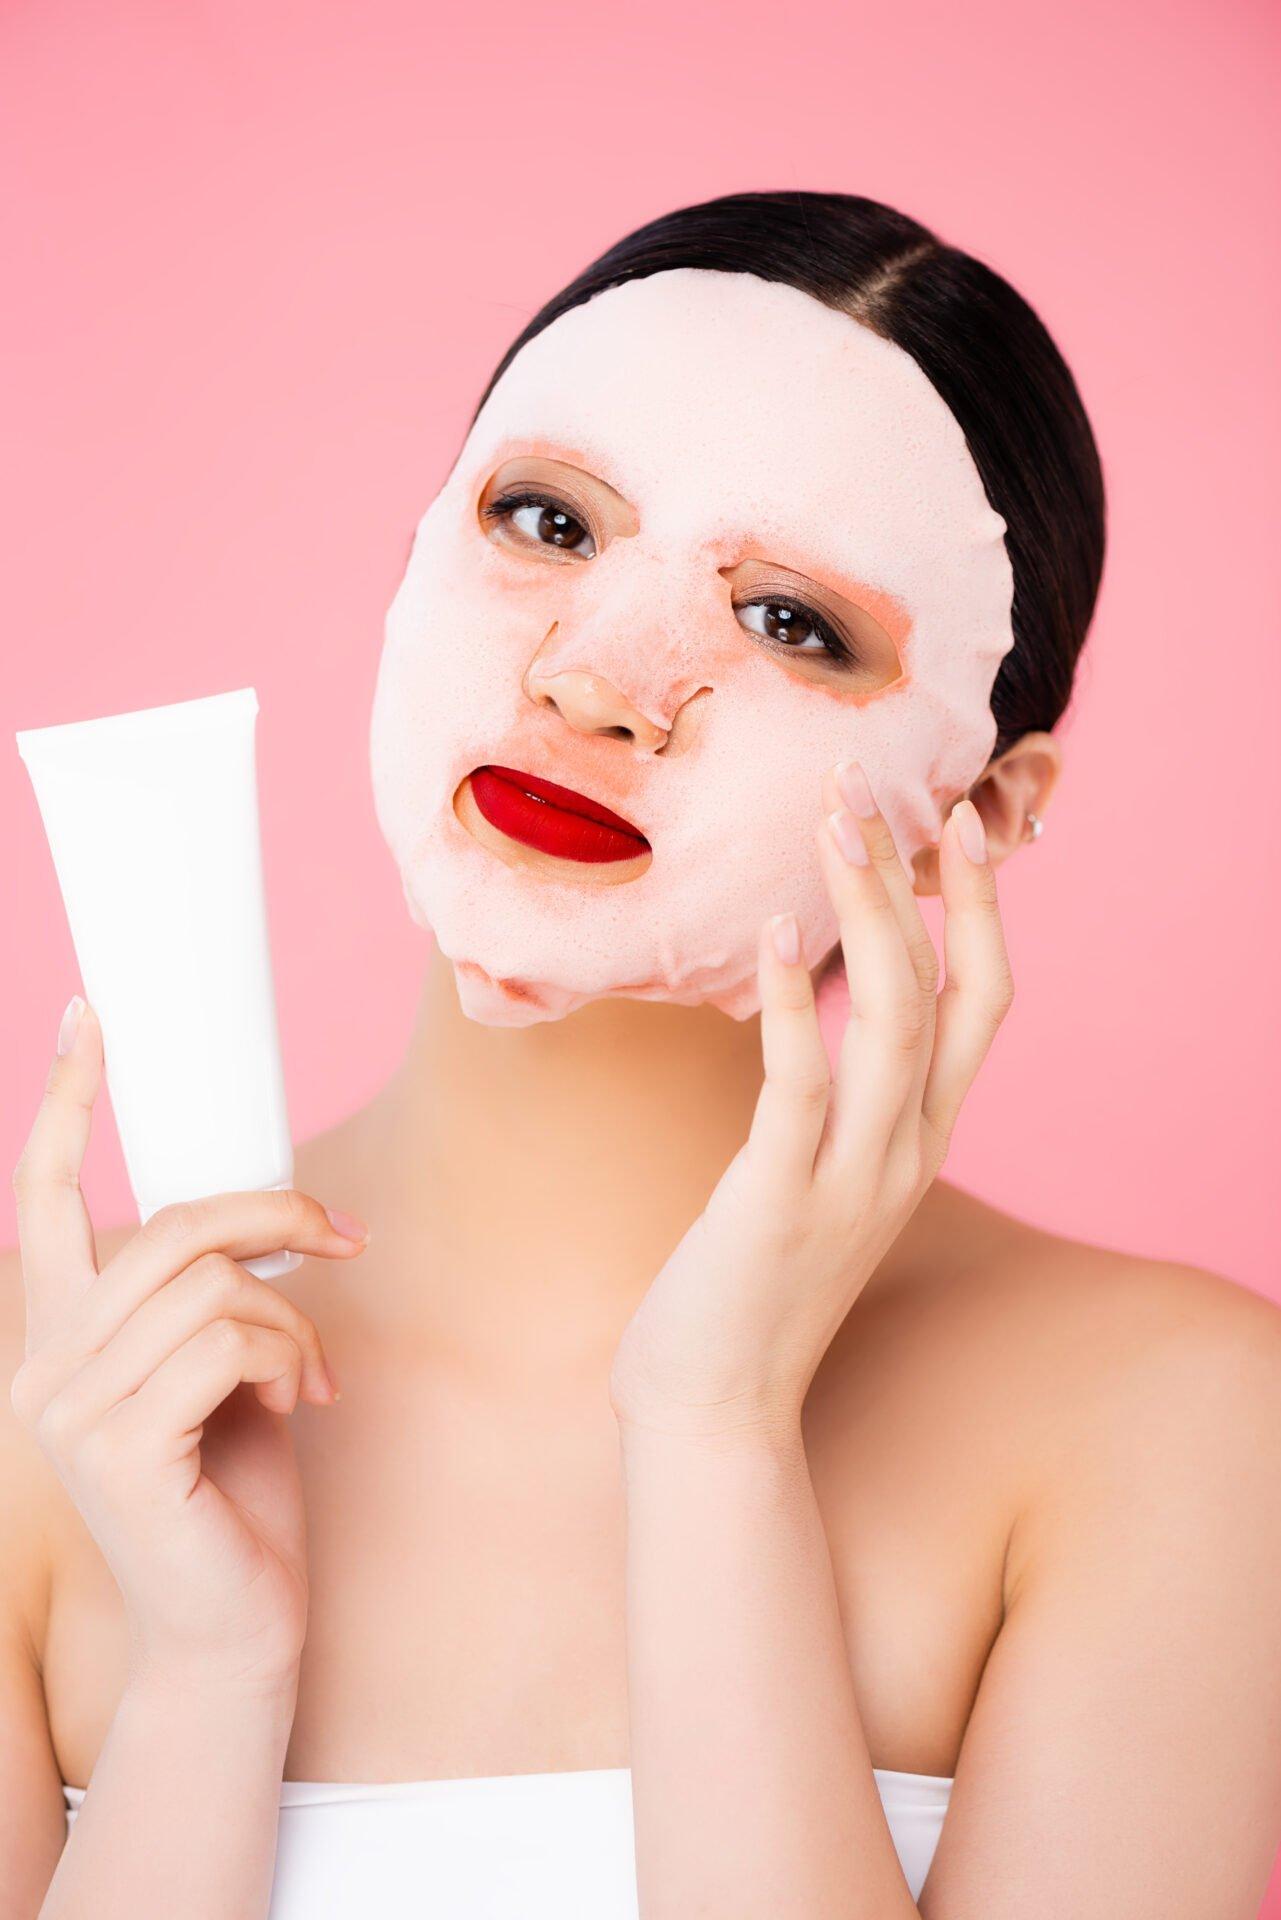 Korean woman winning a non-toxic peel off mask